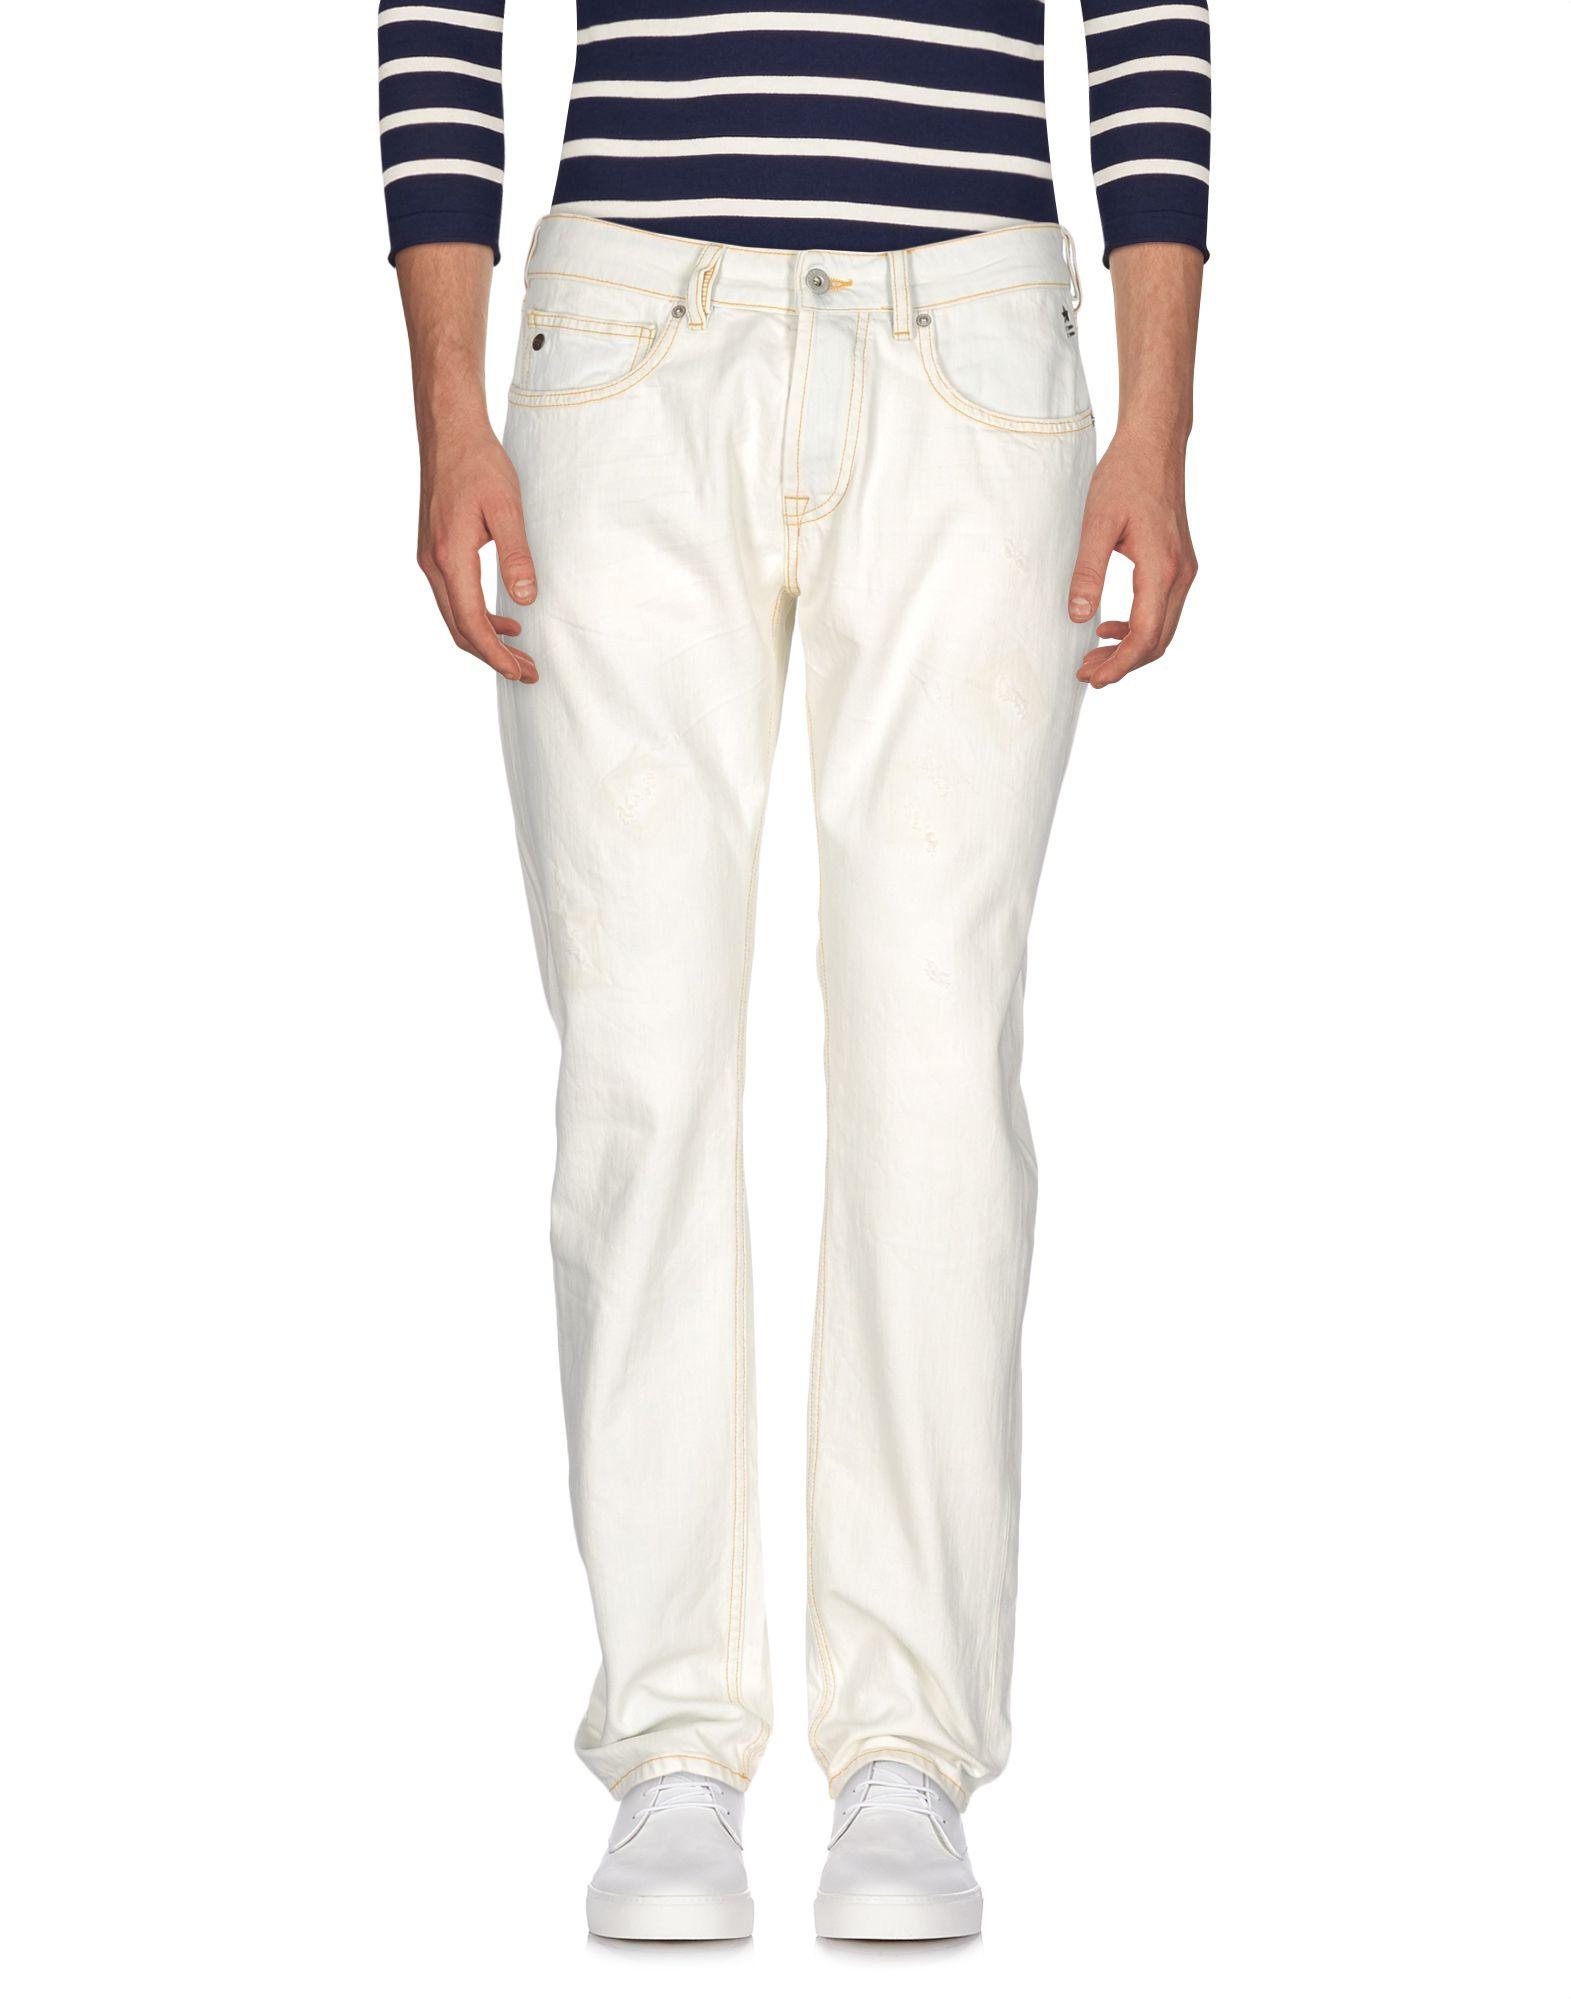 Pantaloni Jeans Uniform Uomo - Acquista online su